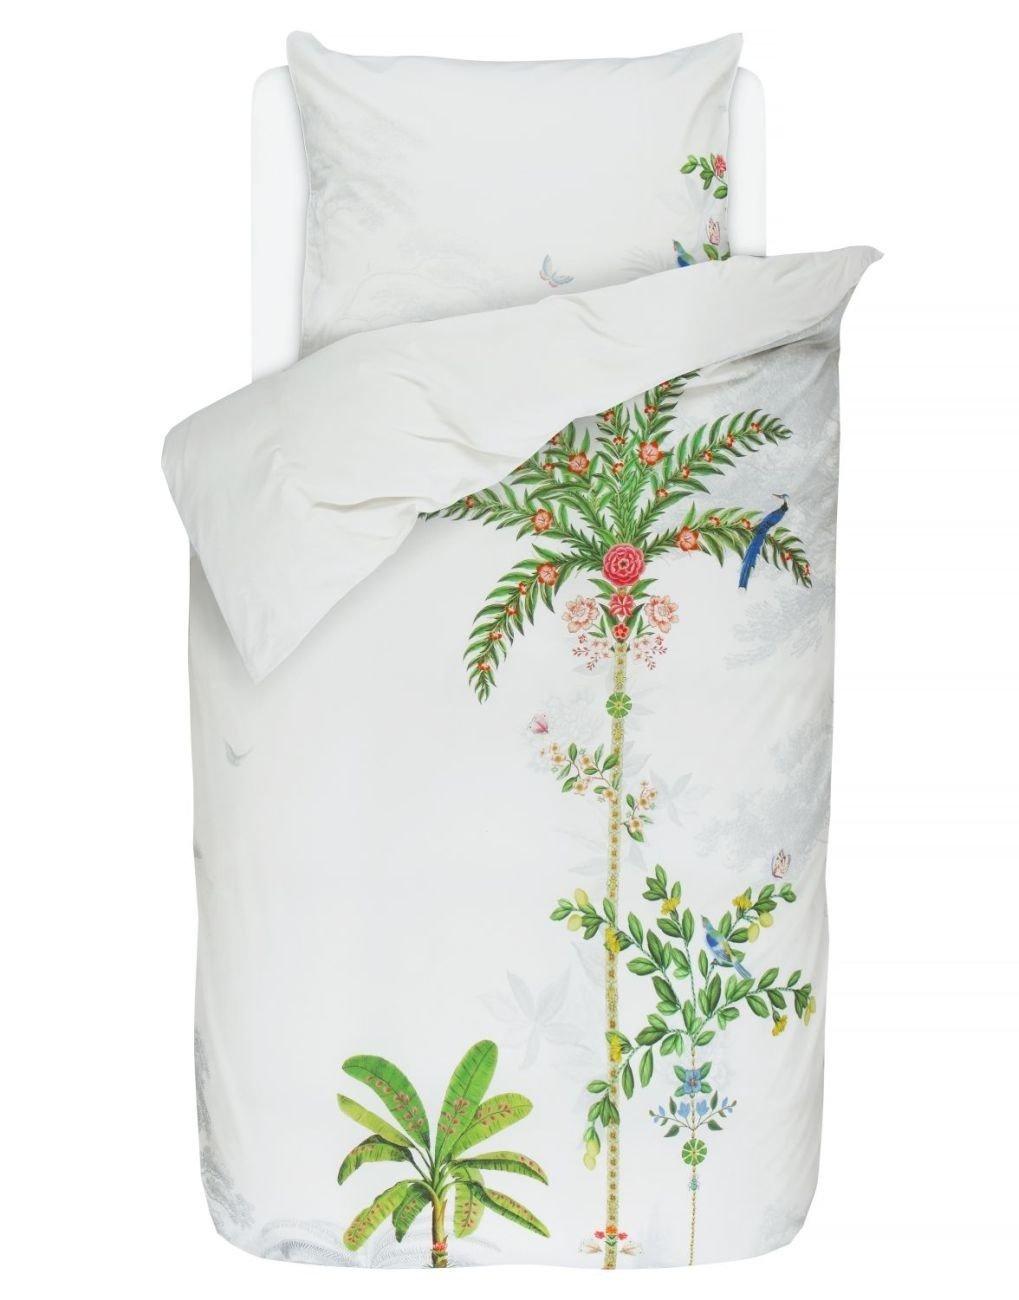 PiP Studio Bettwäsche Indian Palms Weiß Palme Vögel Perkal 135x200 cm 80x80